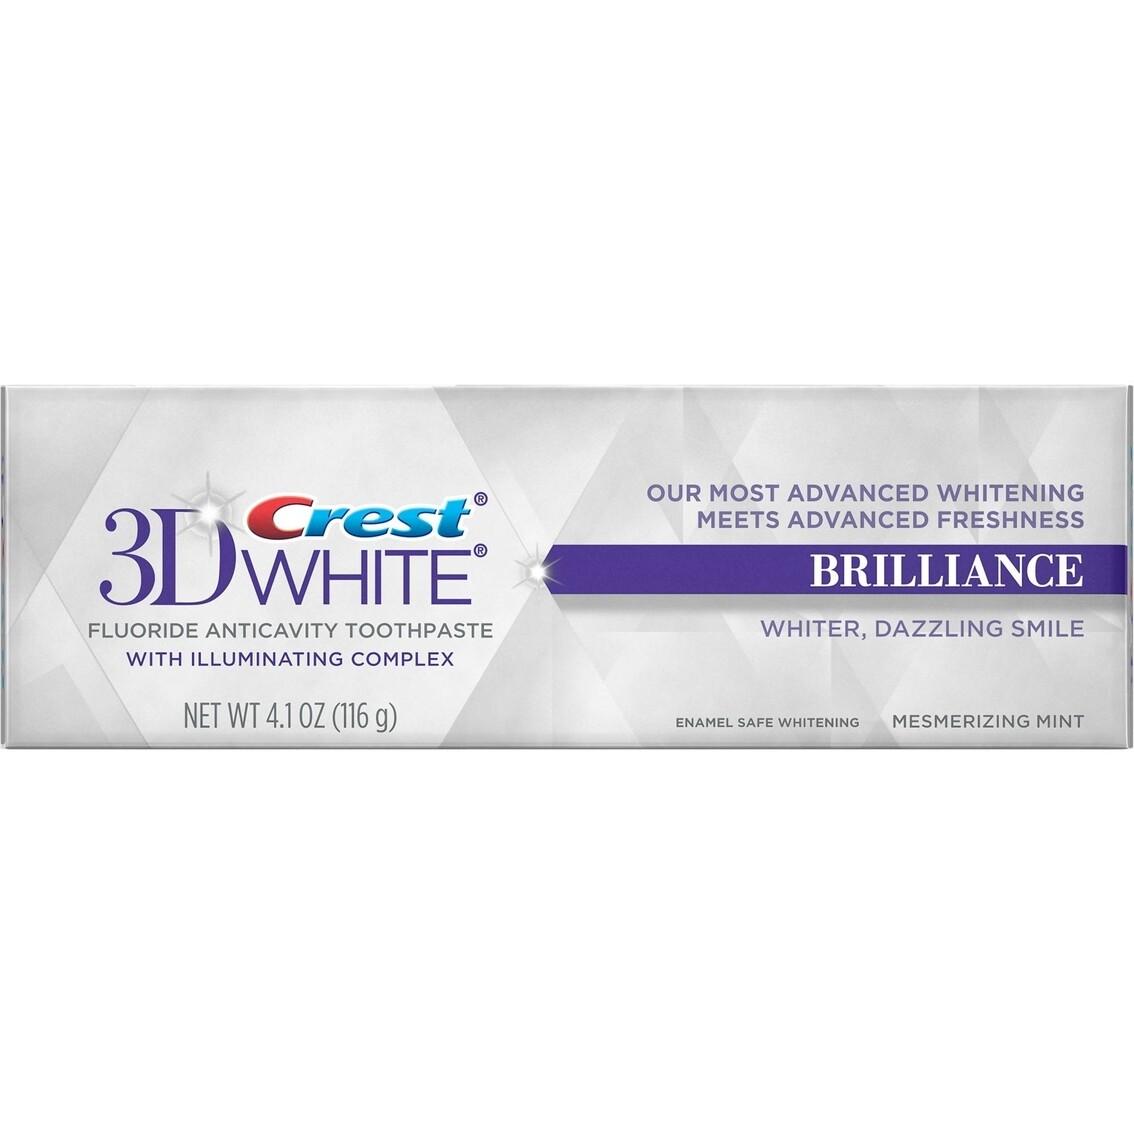 Crest 3D White Brilliance, Enamel Safe Teeth Whitening Toothpaste, Mesmerizing Mint Flavor 4.1 Oz